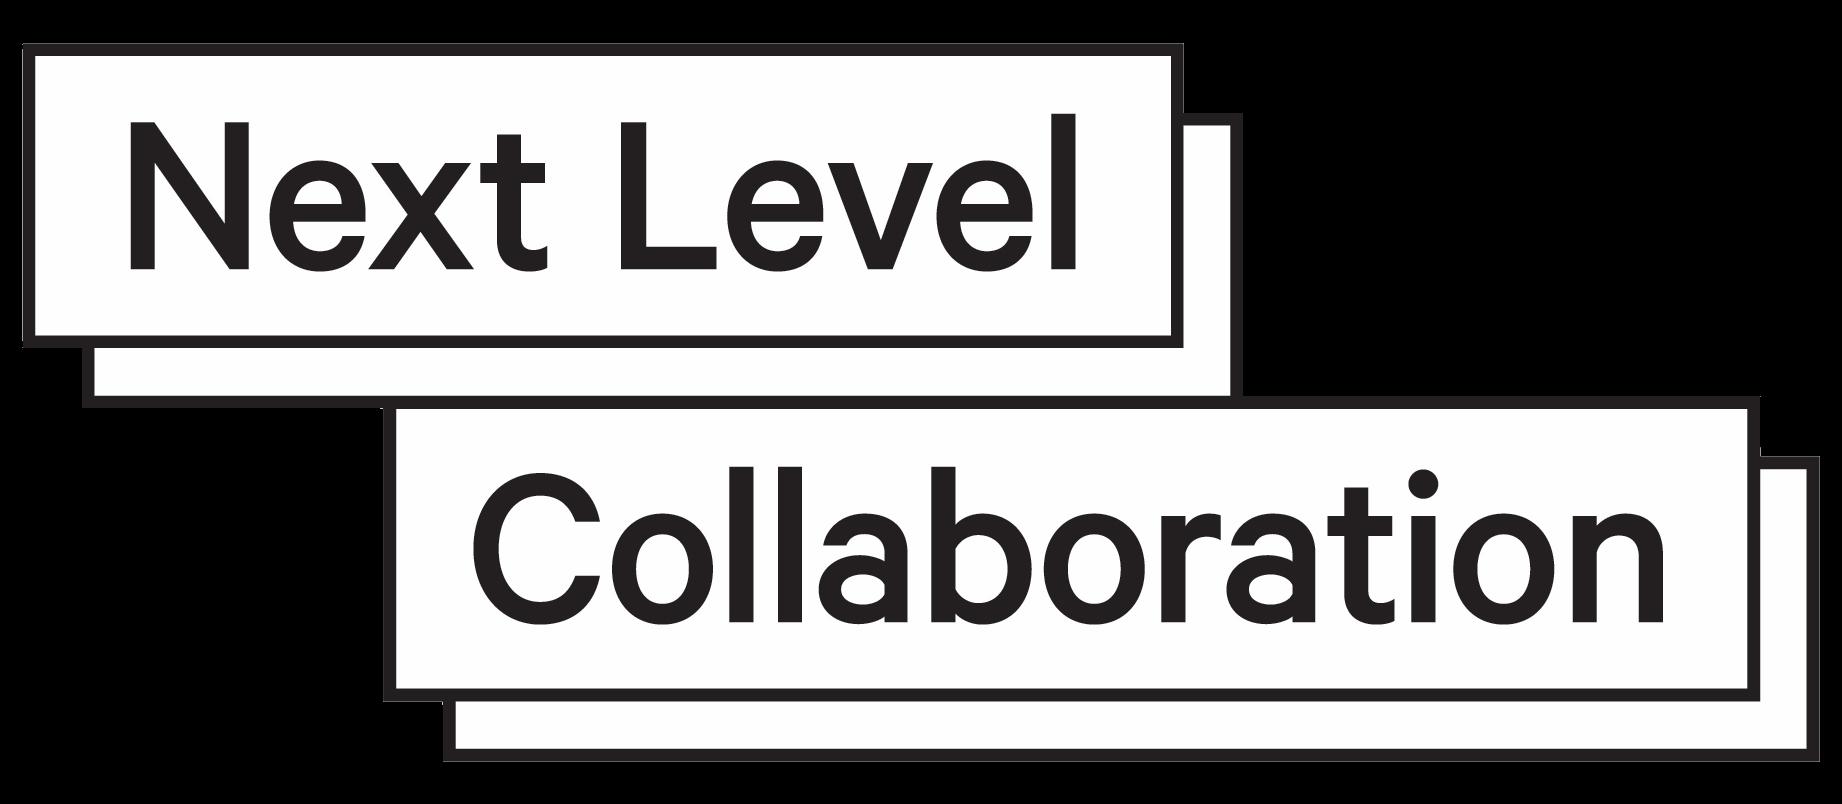 Next Level Collaboration